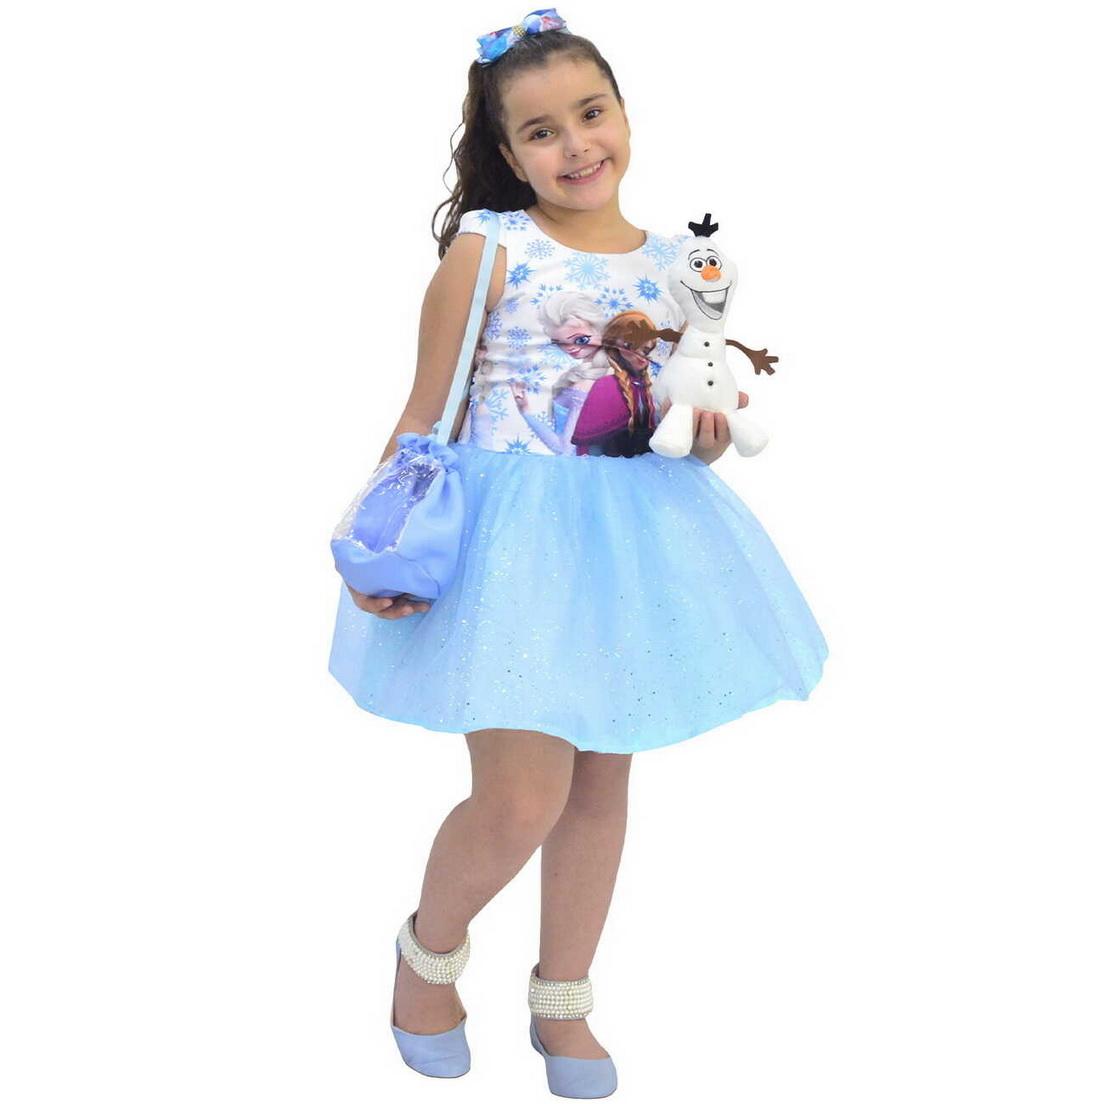 Vestido Frozen Glíter Com Bolsa e Pelúcia do Olaf